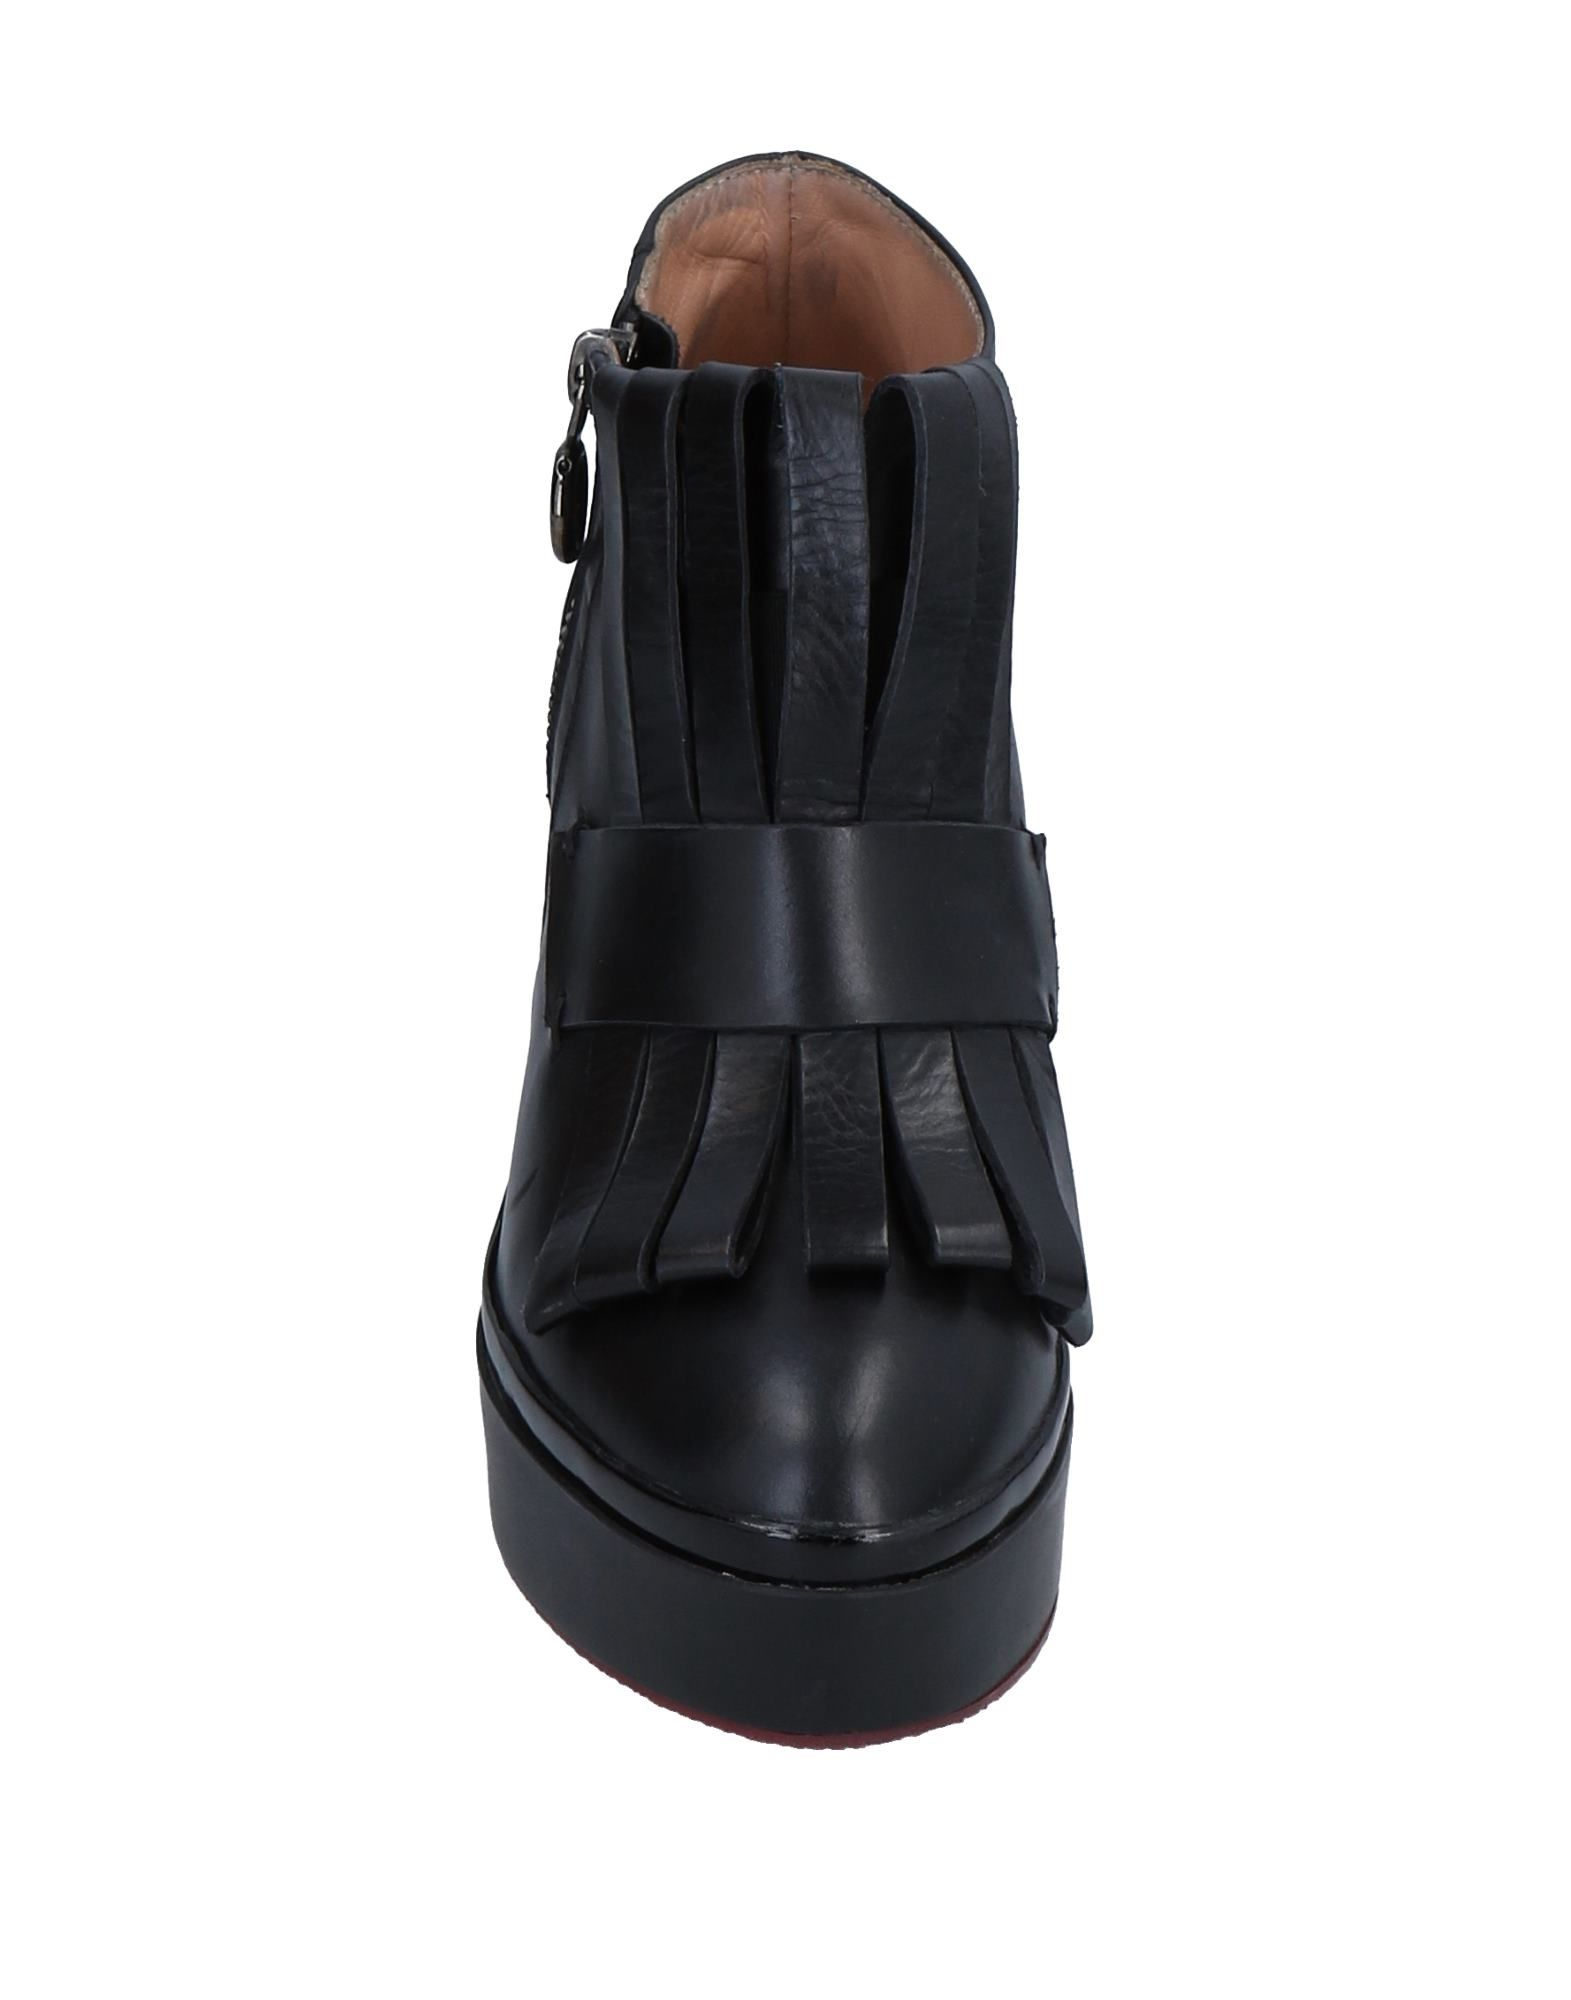 Stilvolle Hécos billige Schuhe Hécos Stilvolle Stiefelette Damen  11521774GR fe58a0